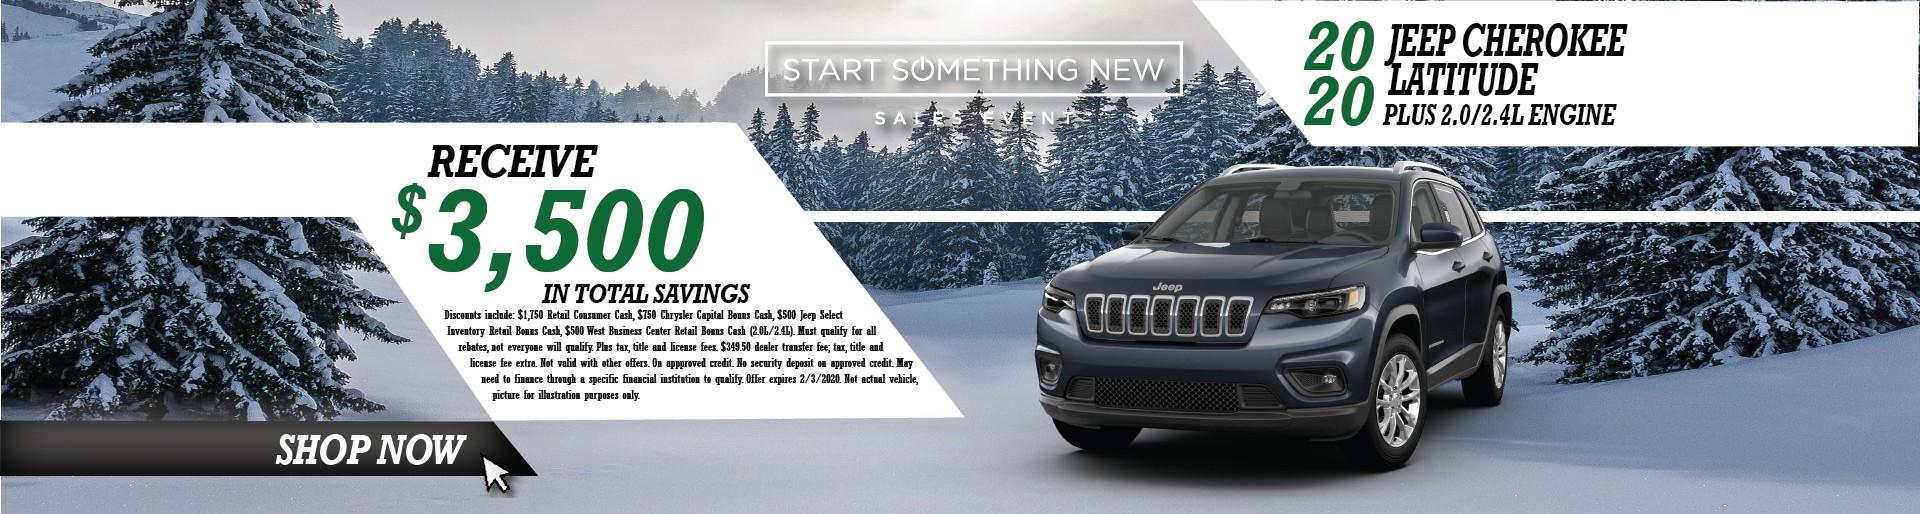 2020 Jeep Cherokee Latitude Plys